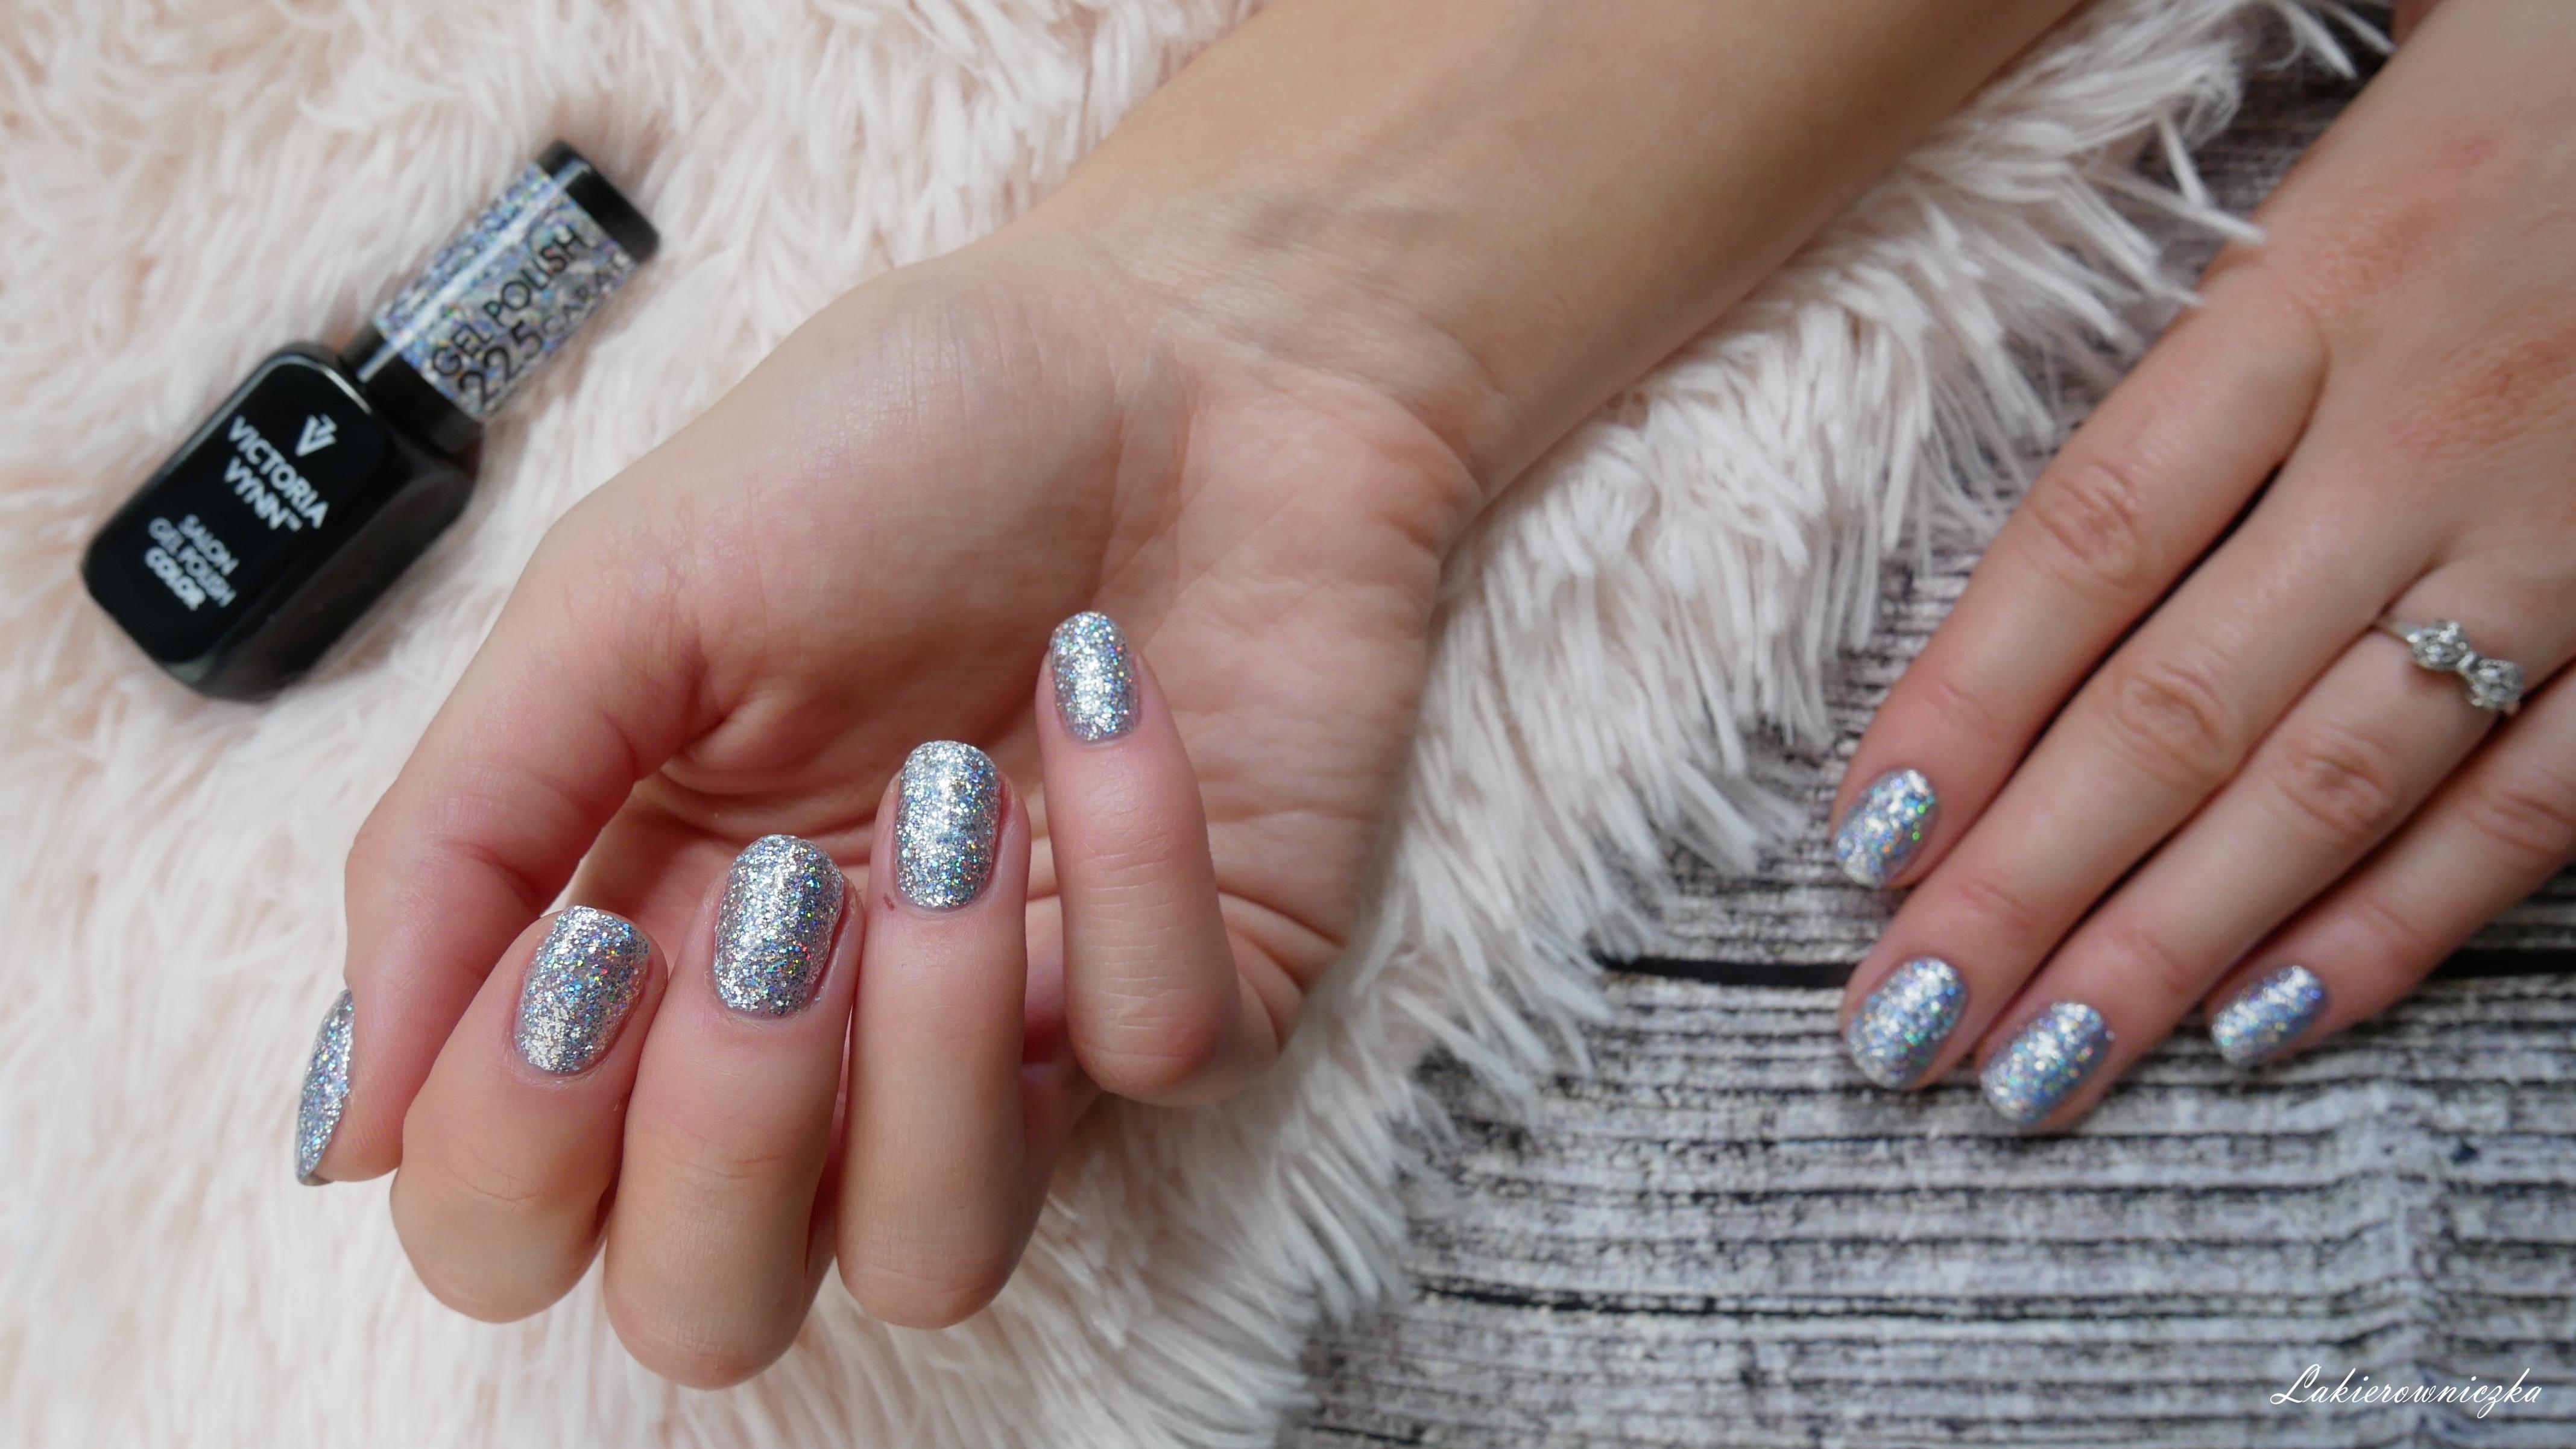 Victoria-vynn-225-silver-diamond-carat-holo-hybryda-gel-polish-brokatowy-srebrny-lakiery-Lakierowniczka-225 silver diamond carat